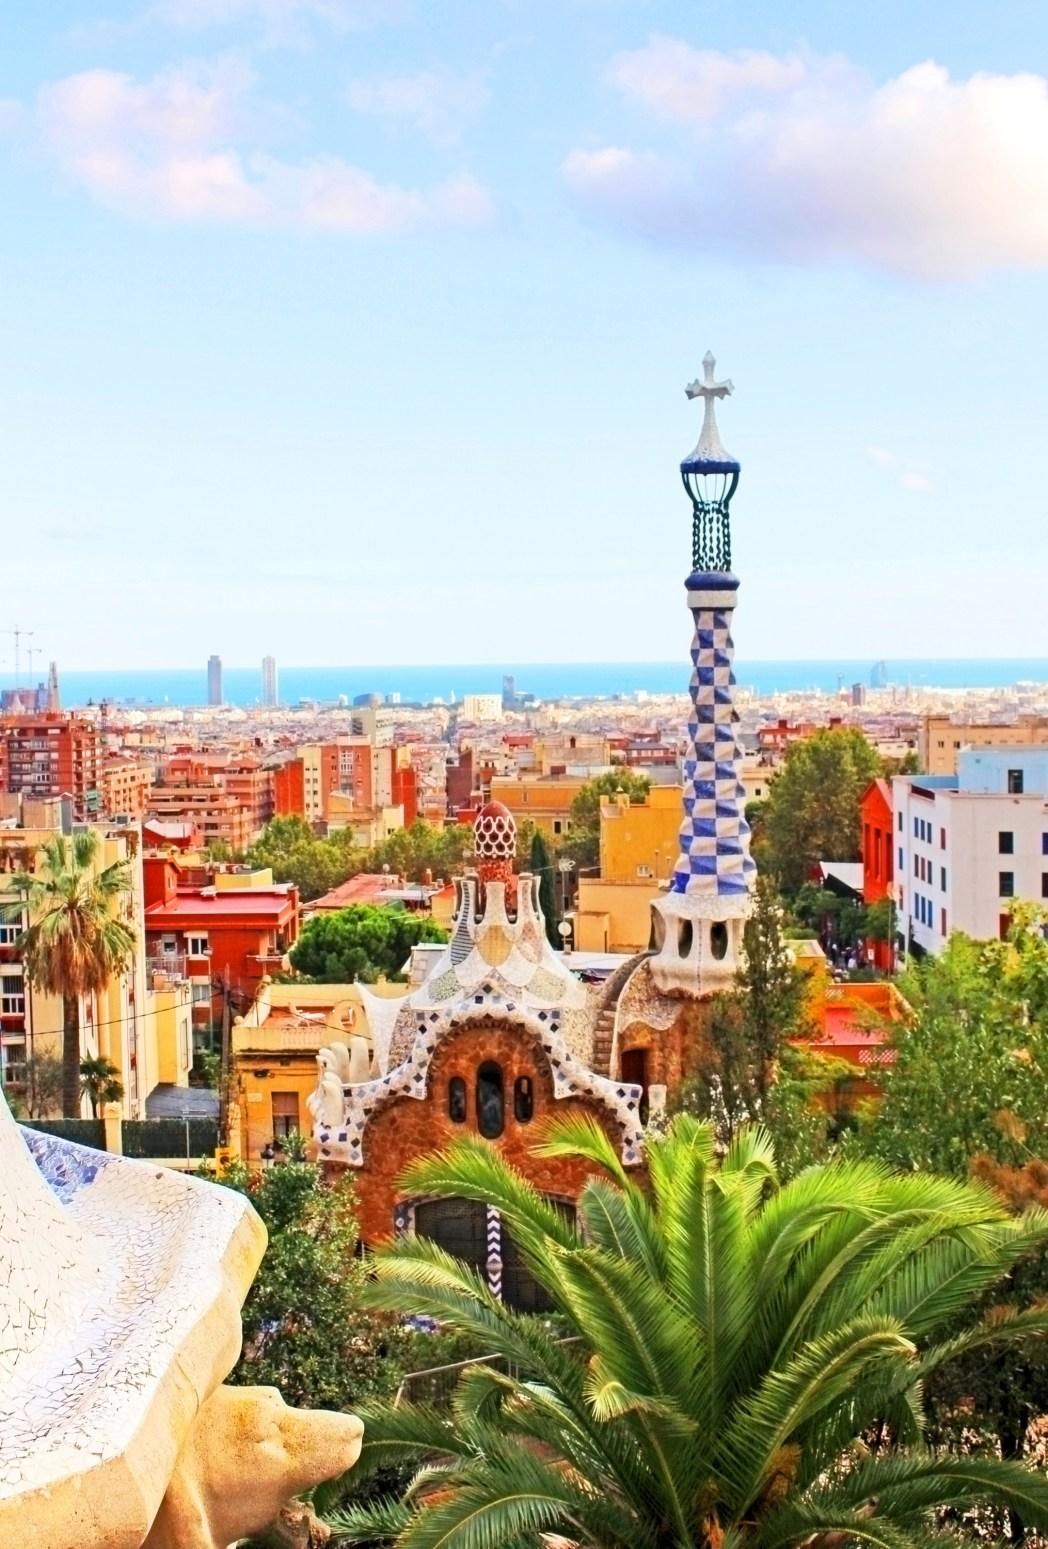 Parc Guell στη Βαρκελώνη - τοπ 20 φθινοπωρινοί προορισμοί